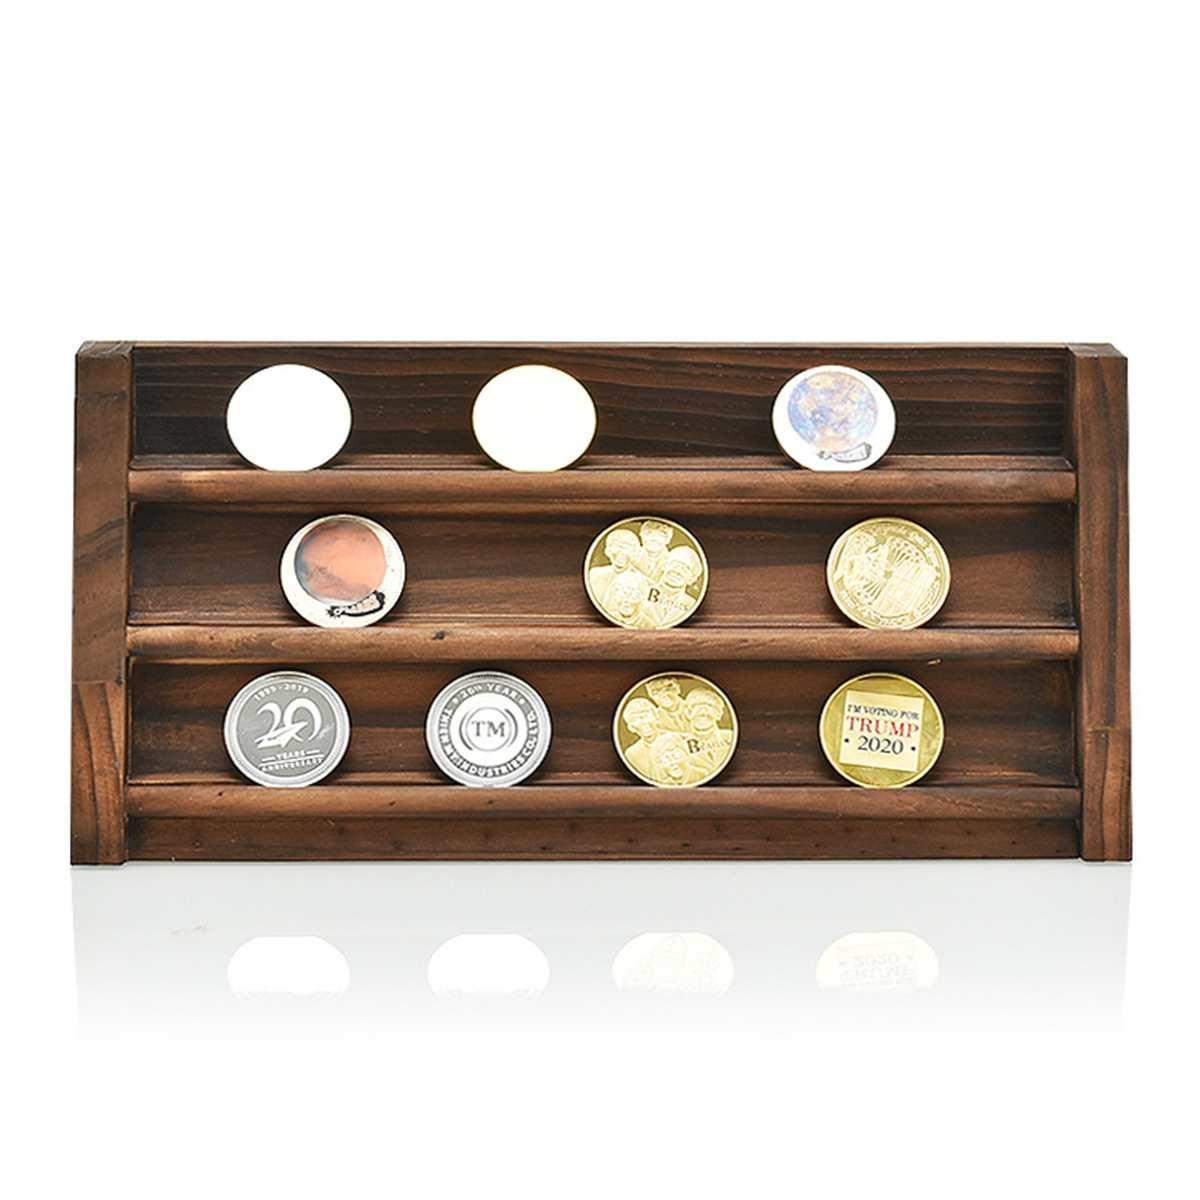 2 Styles Coin Display Stand Coin Case Collector Wooden Coin Storage Shelves Collectible Coins Holder Display Album Coin Case